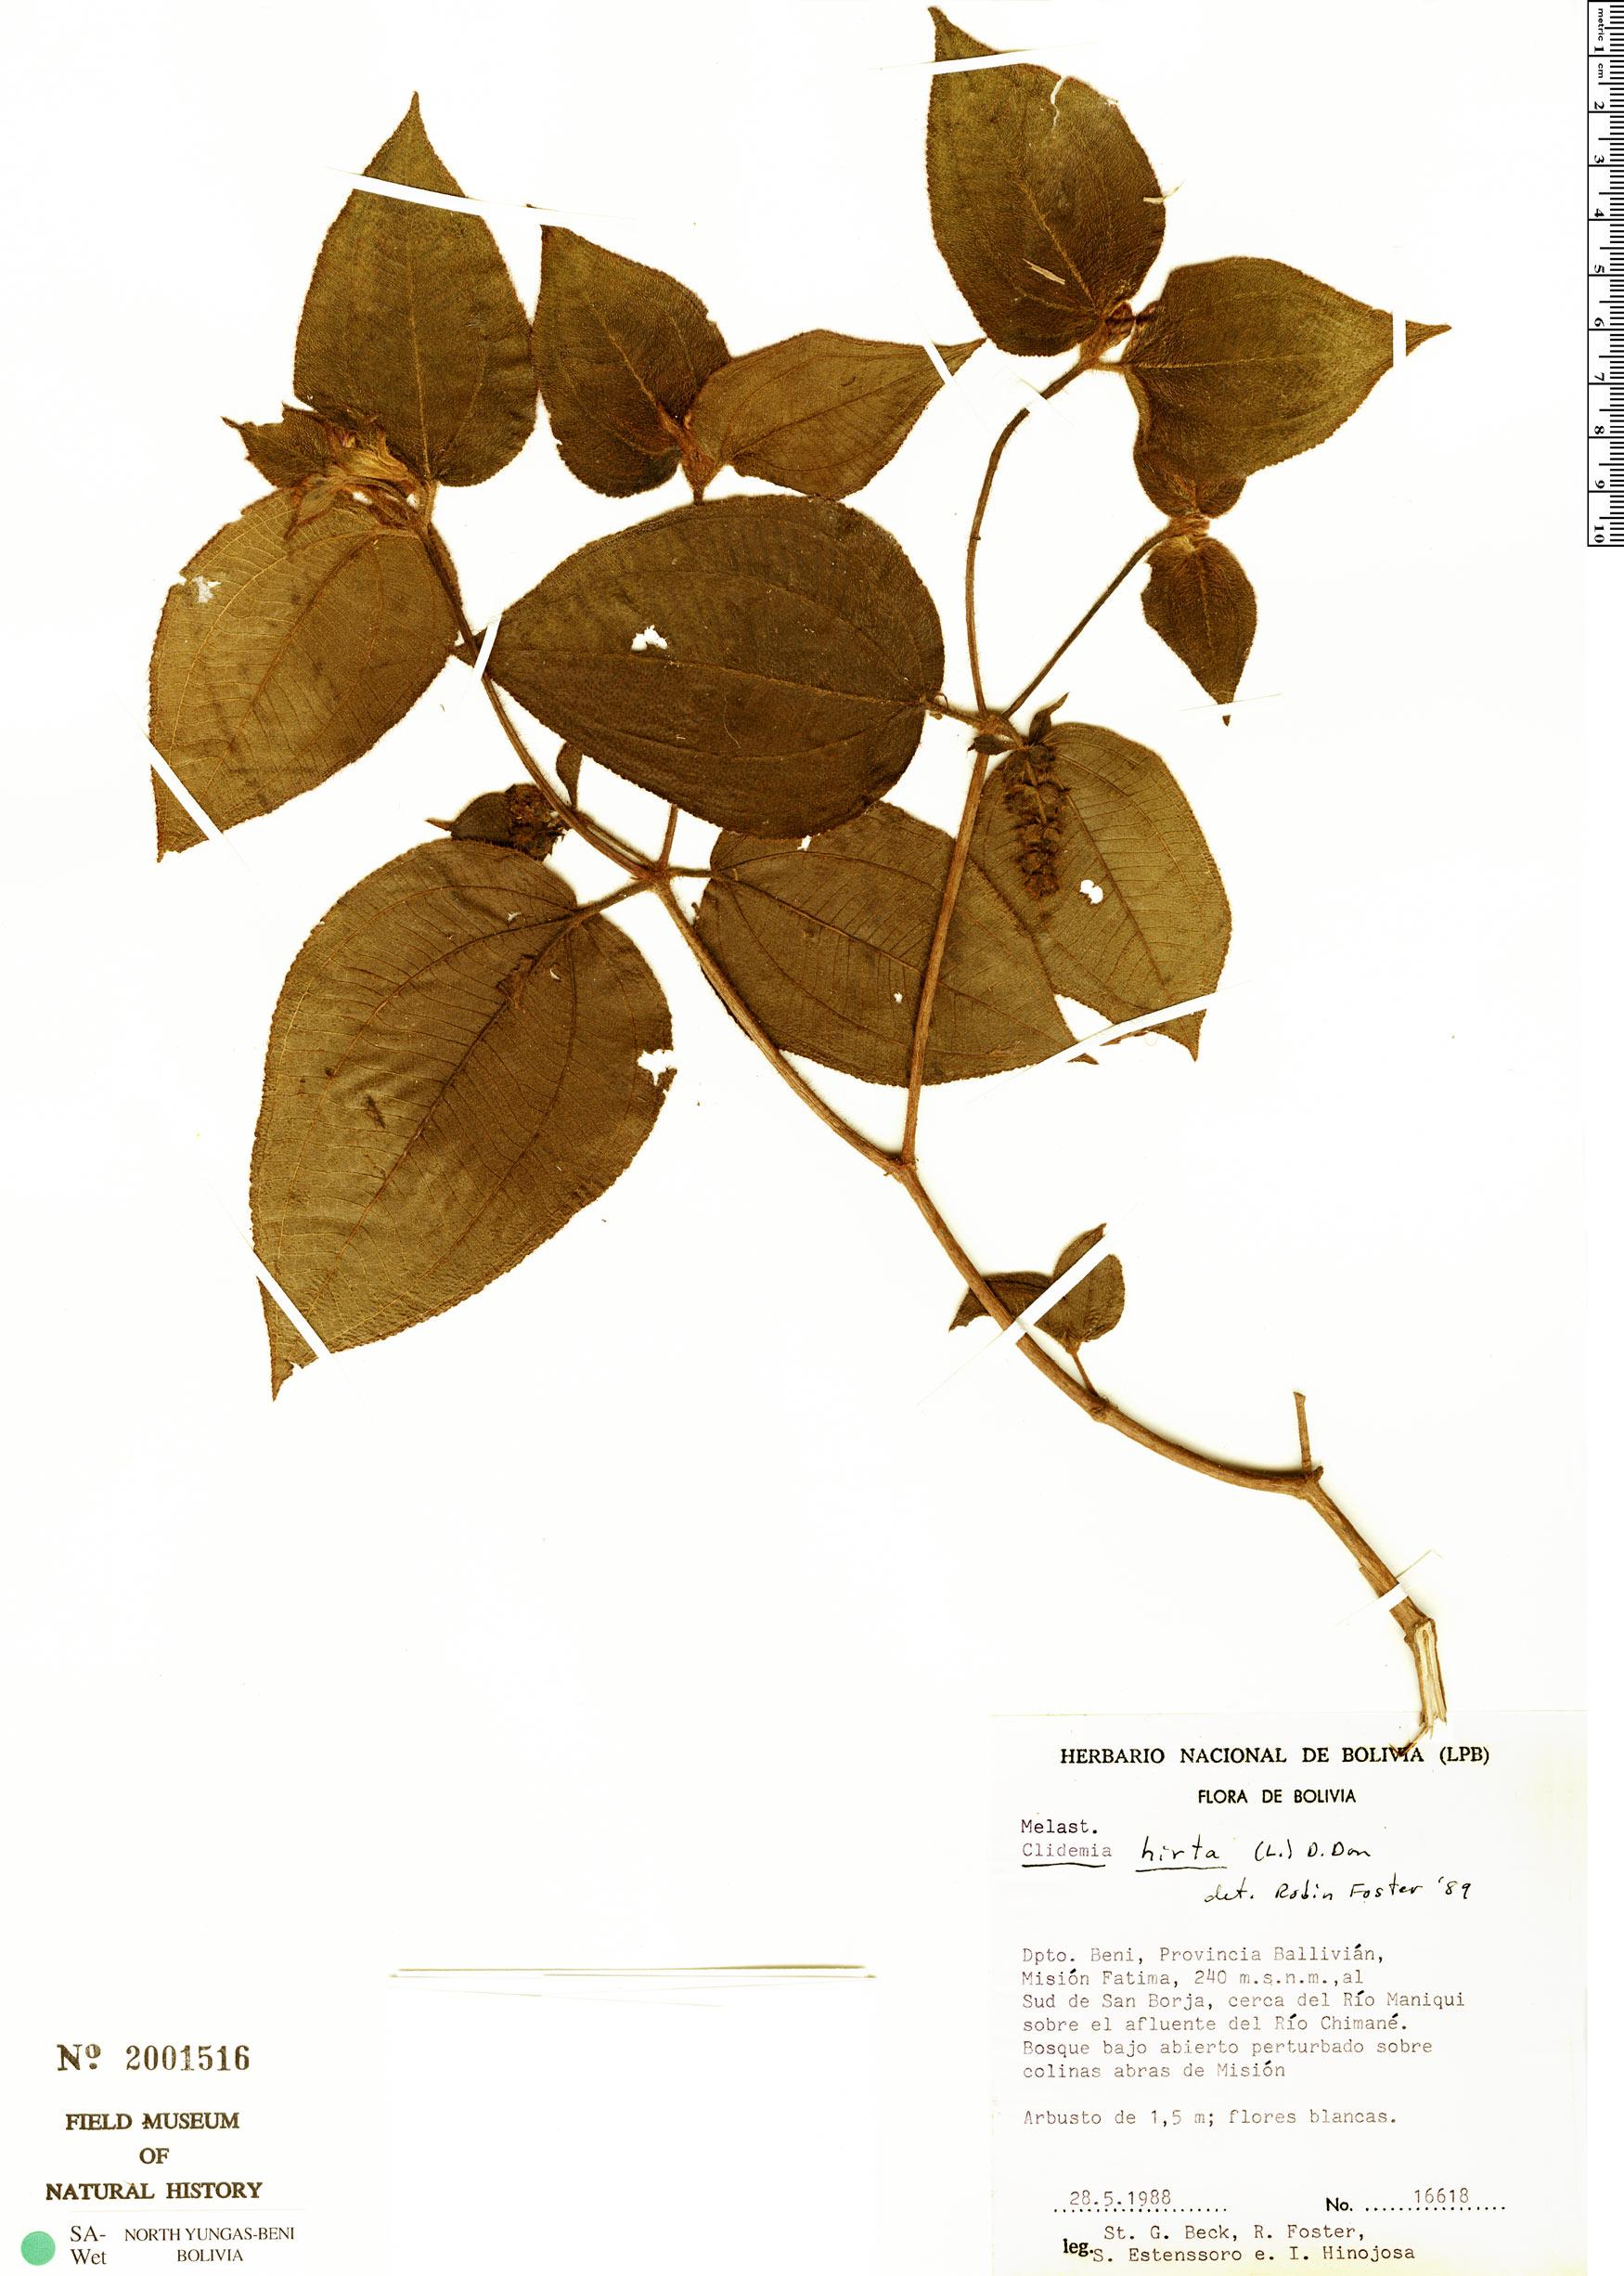 Specimen: Clidemia hirta